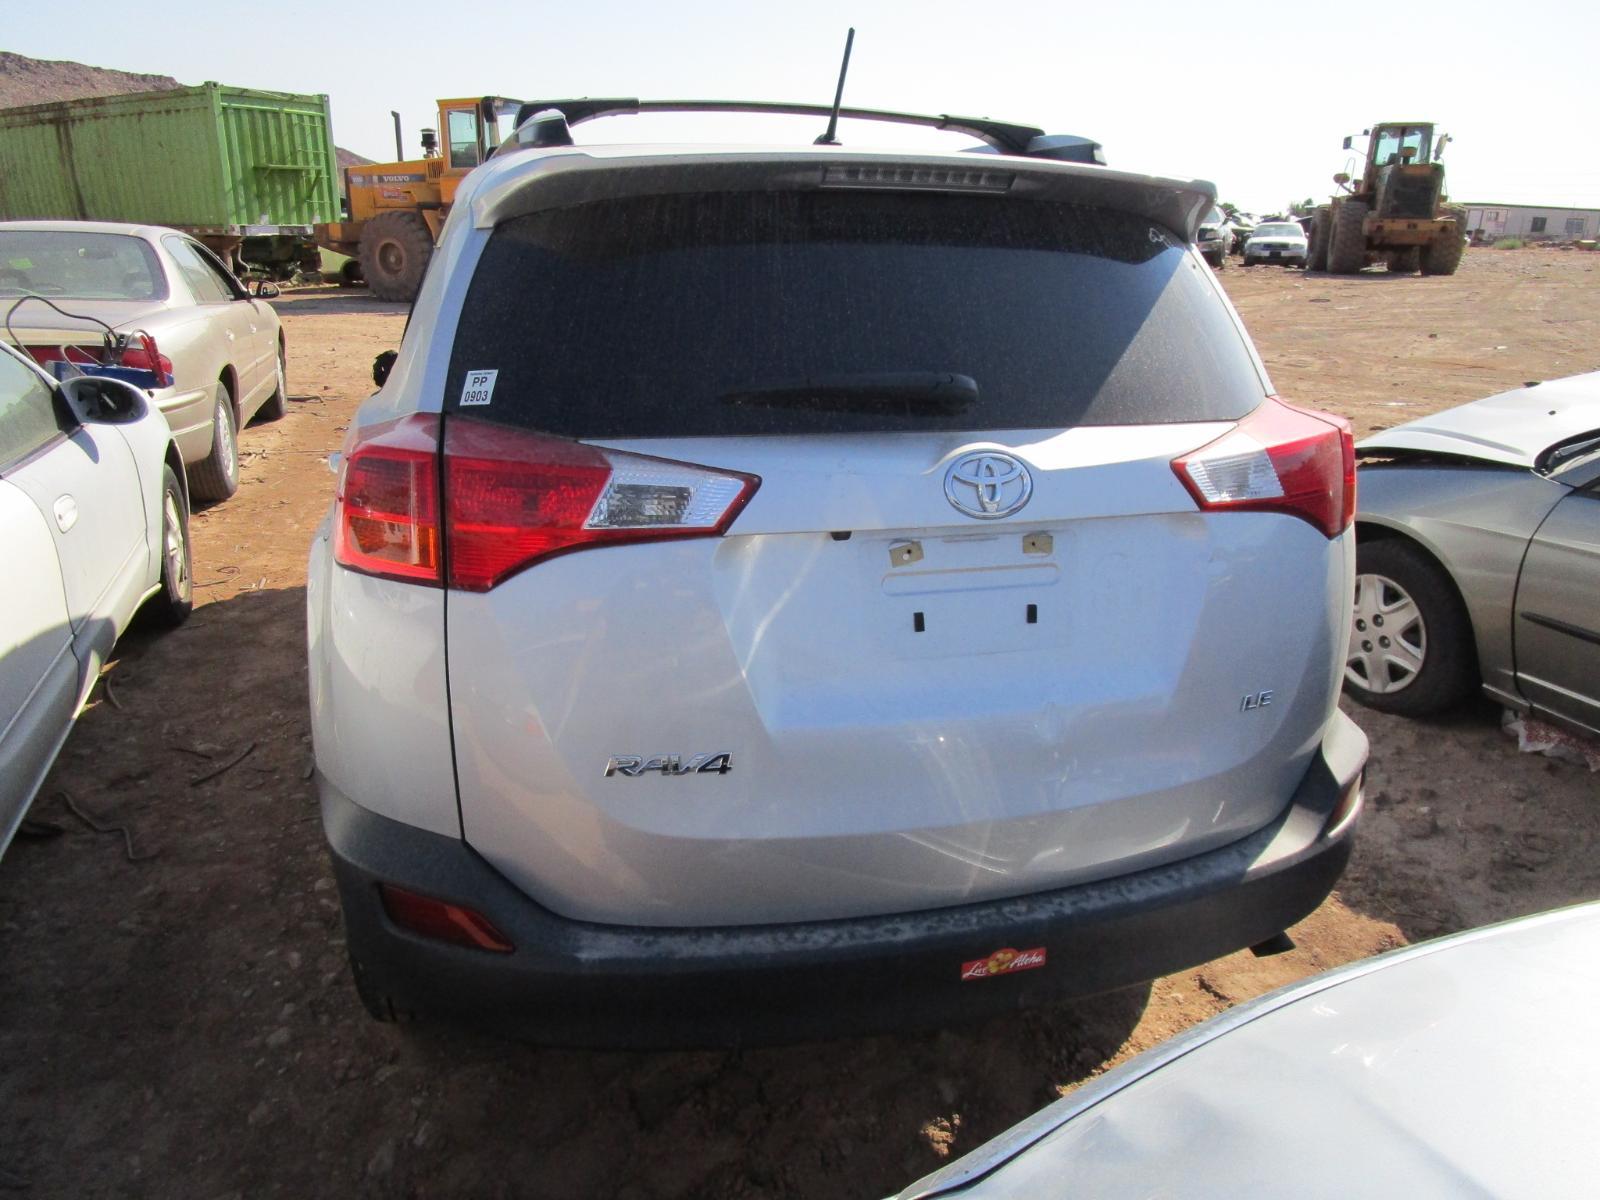 Toyota Rav4 Decklid Tailgate Used Suv Parts 2013 Fuse Box 2ad81192 F1b1 4787 82a9 3a53c193bc41